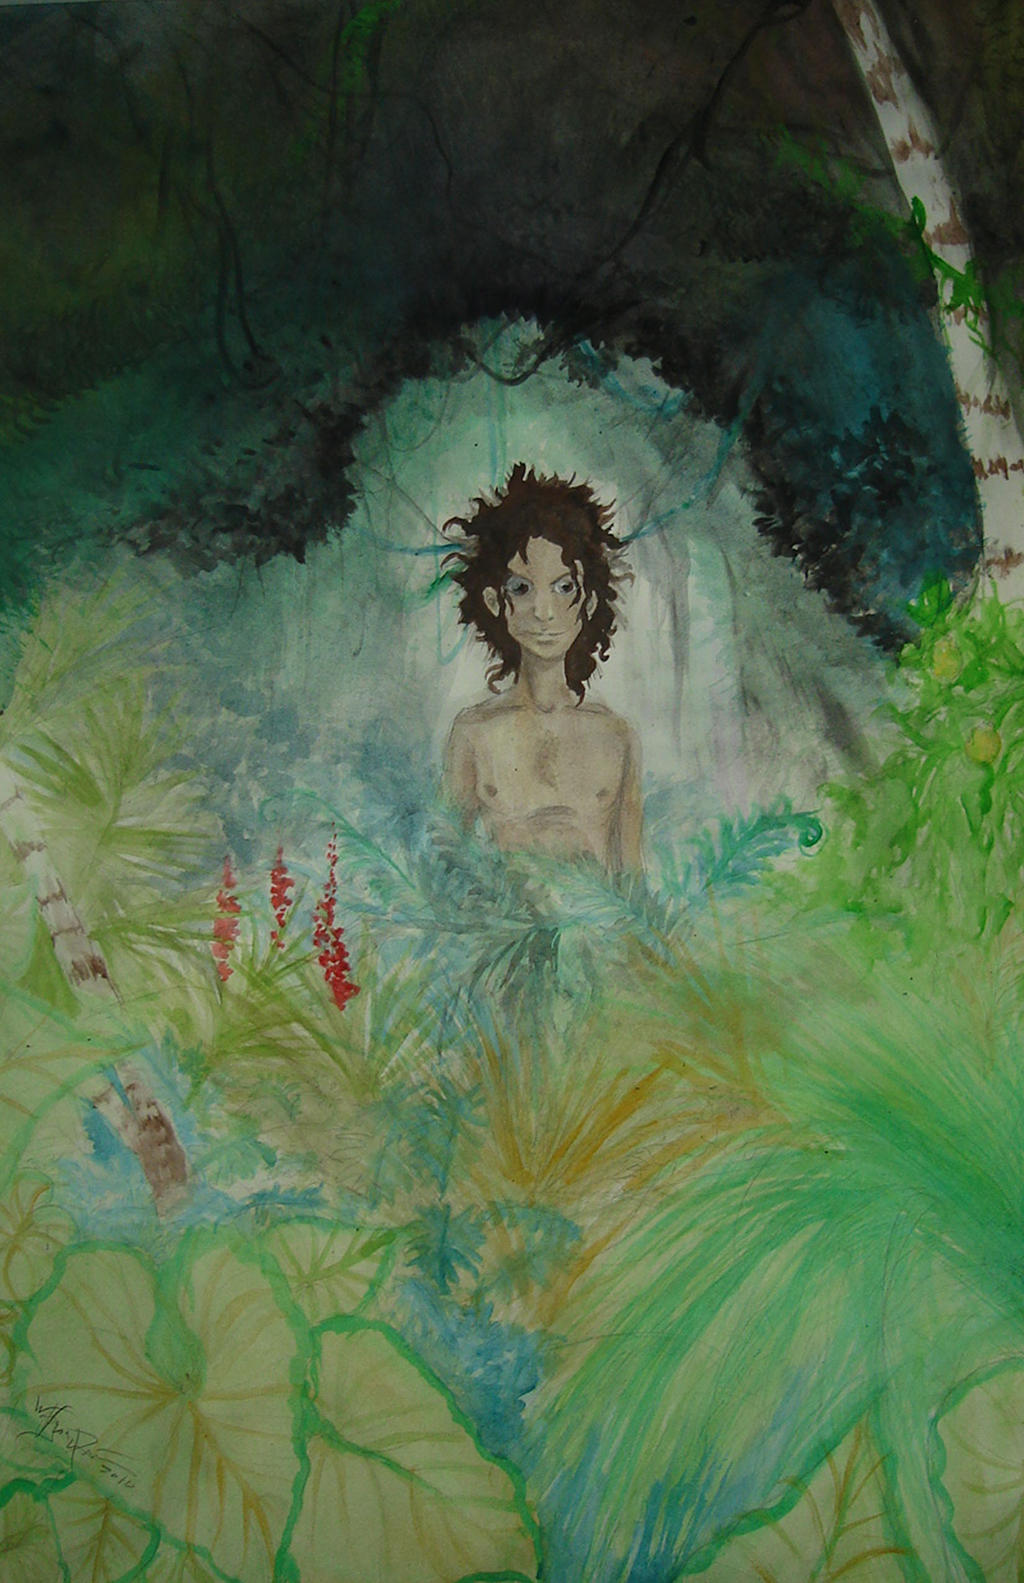 Mowgli FULL by Hirnverbrannt